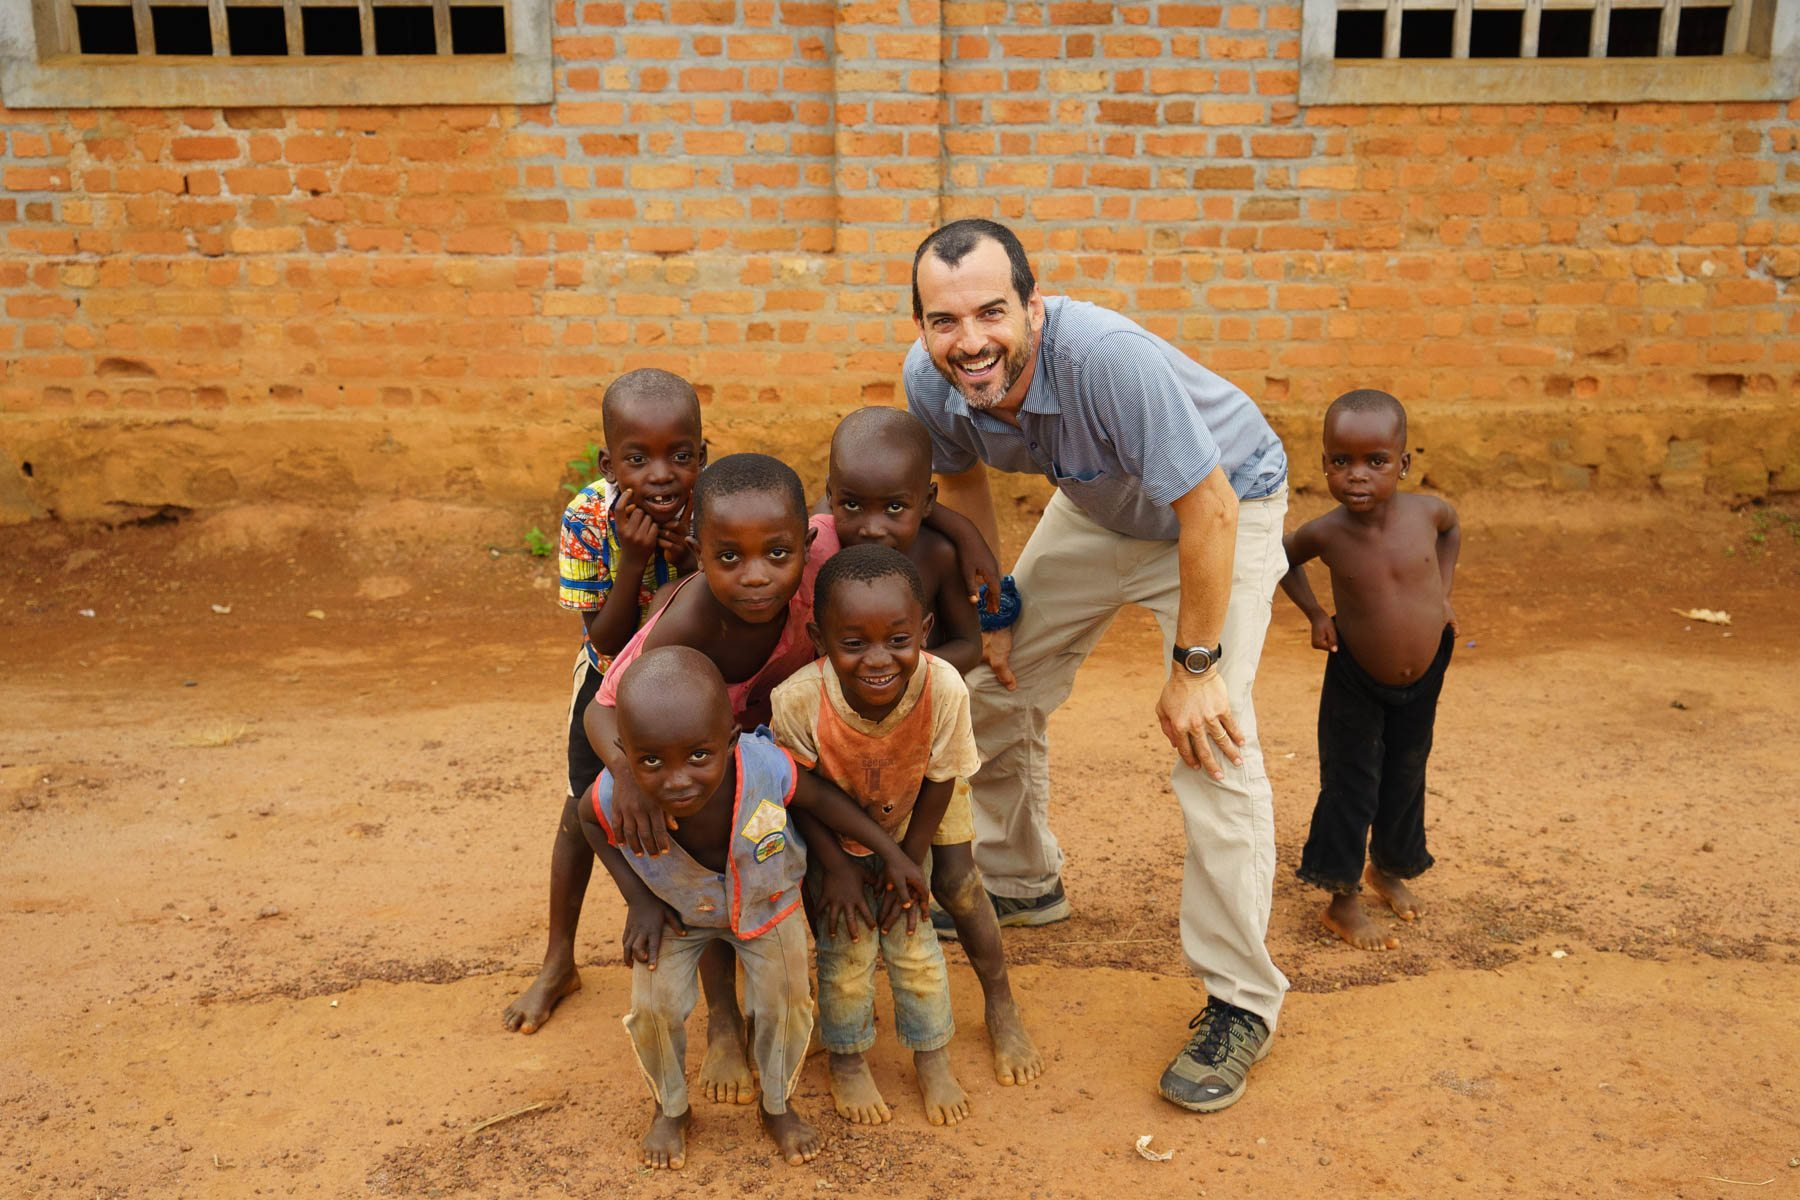 20150913_Africa-1848-1.jpg